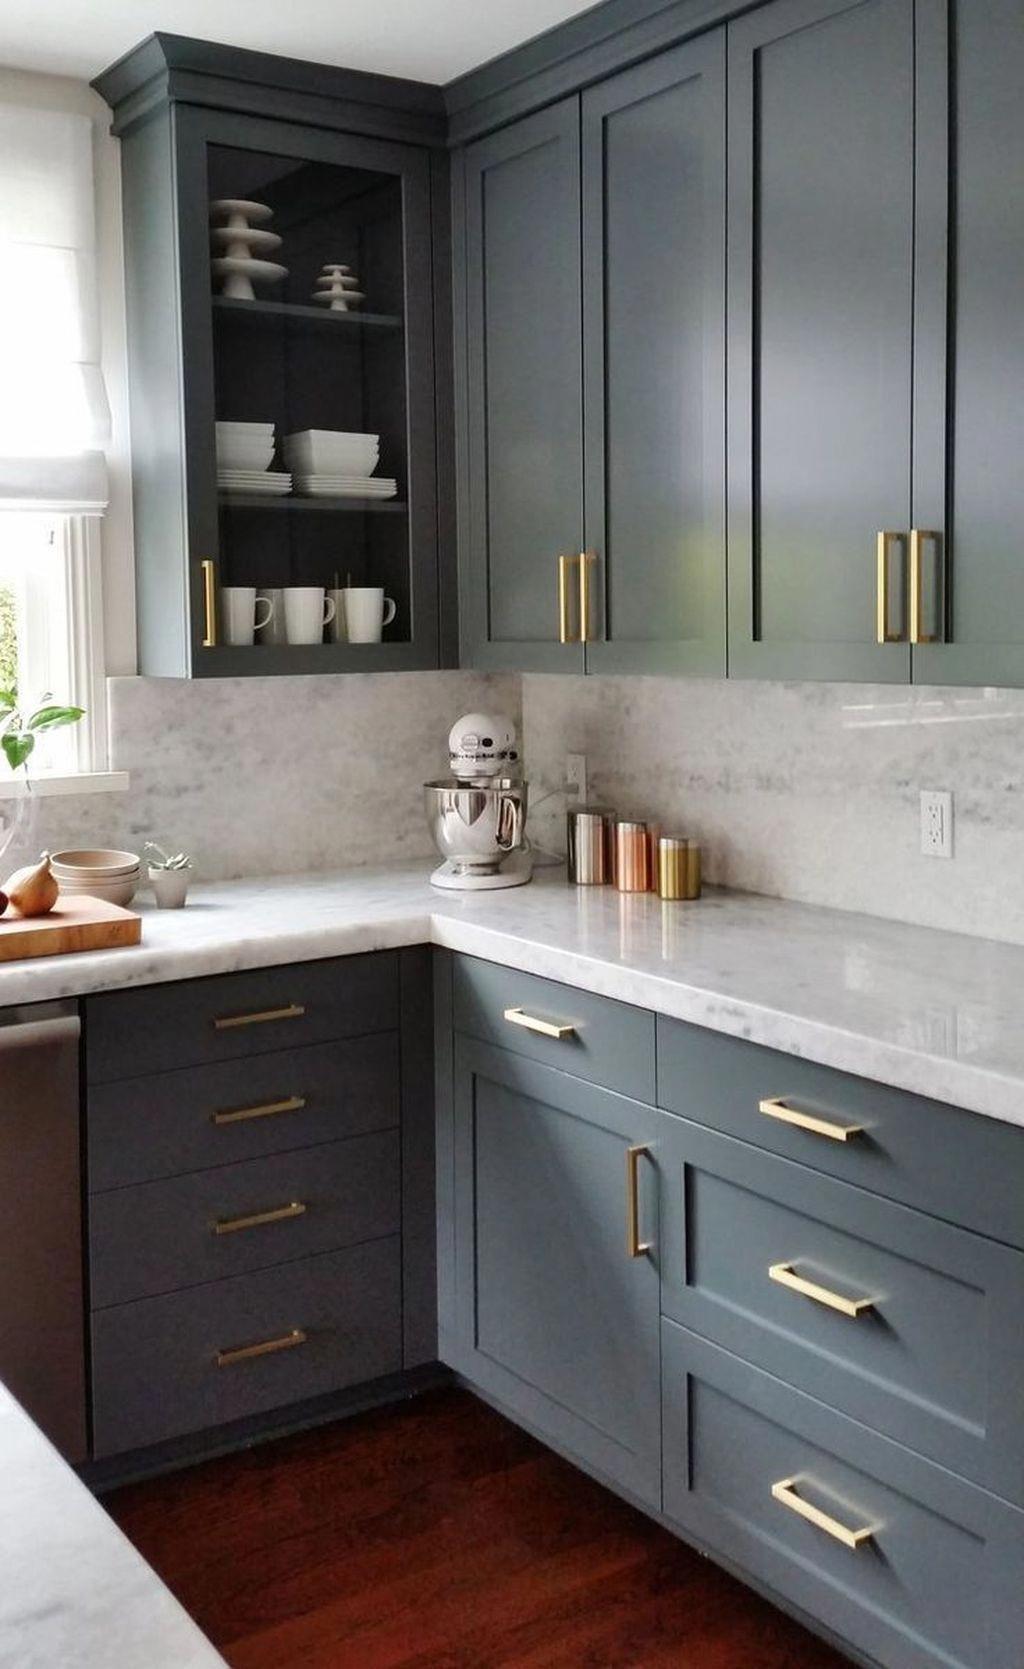 Cheap Home Decor  Kitchen Model Ideas  New Simple Kitchen